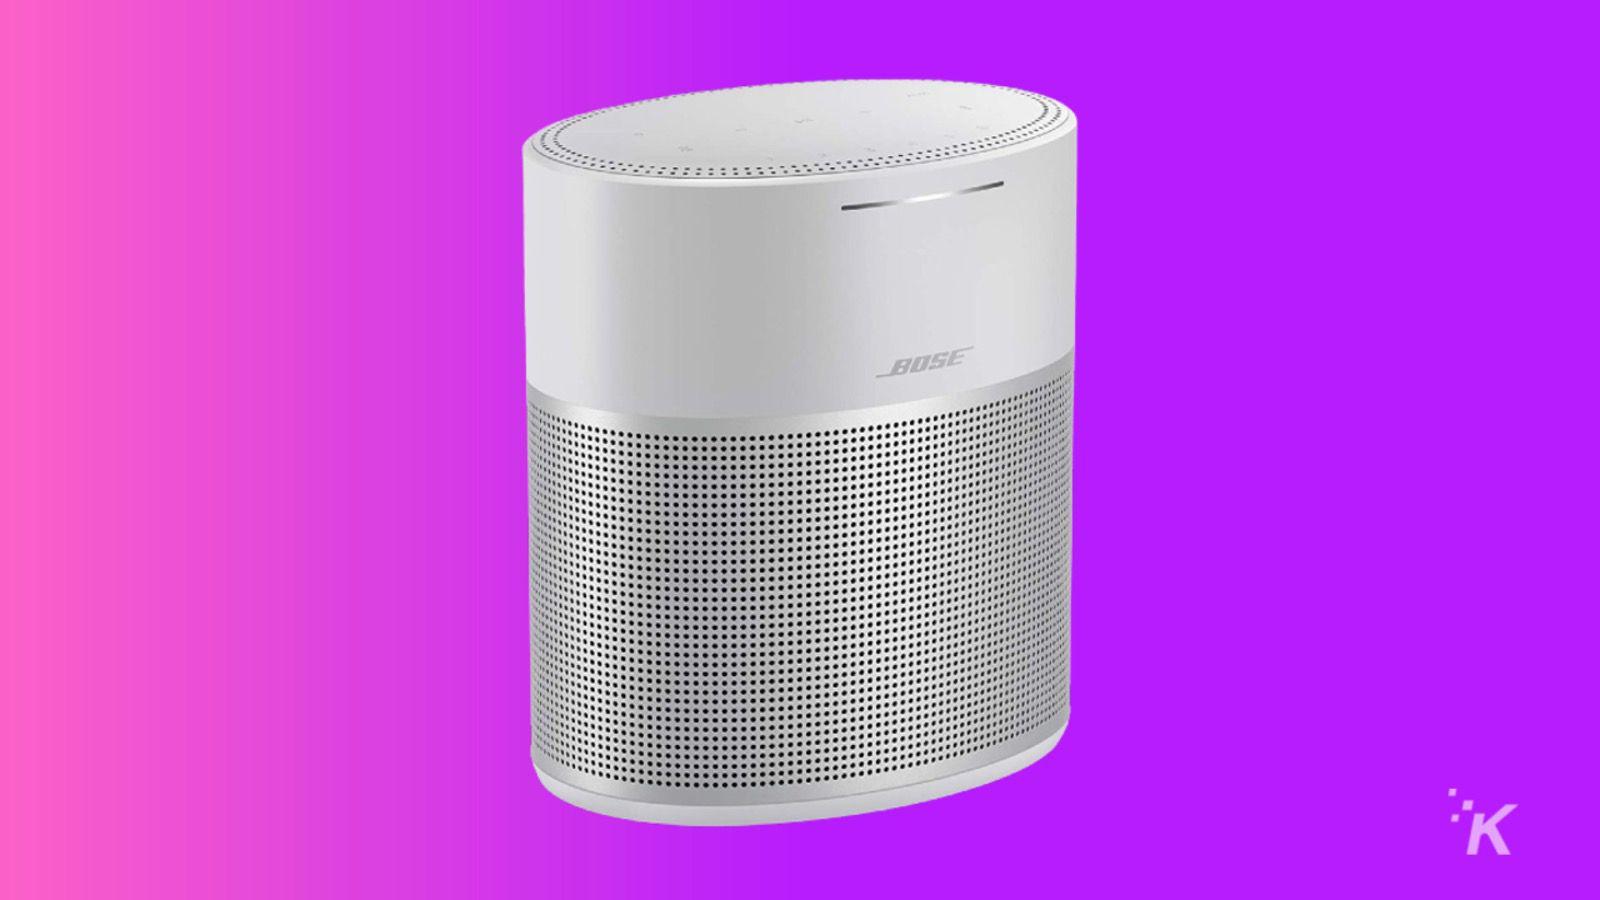 bose 300 speaker knowtechie black fridahy